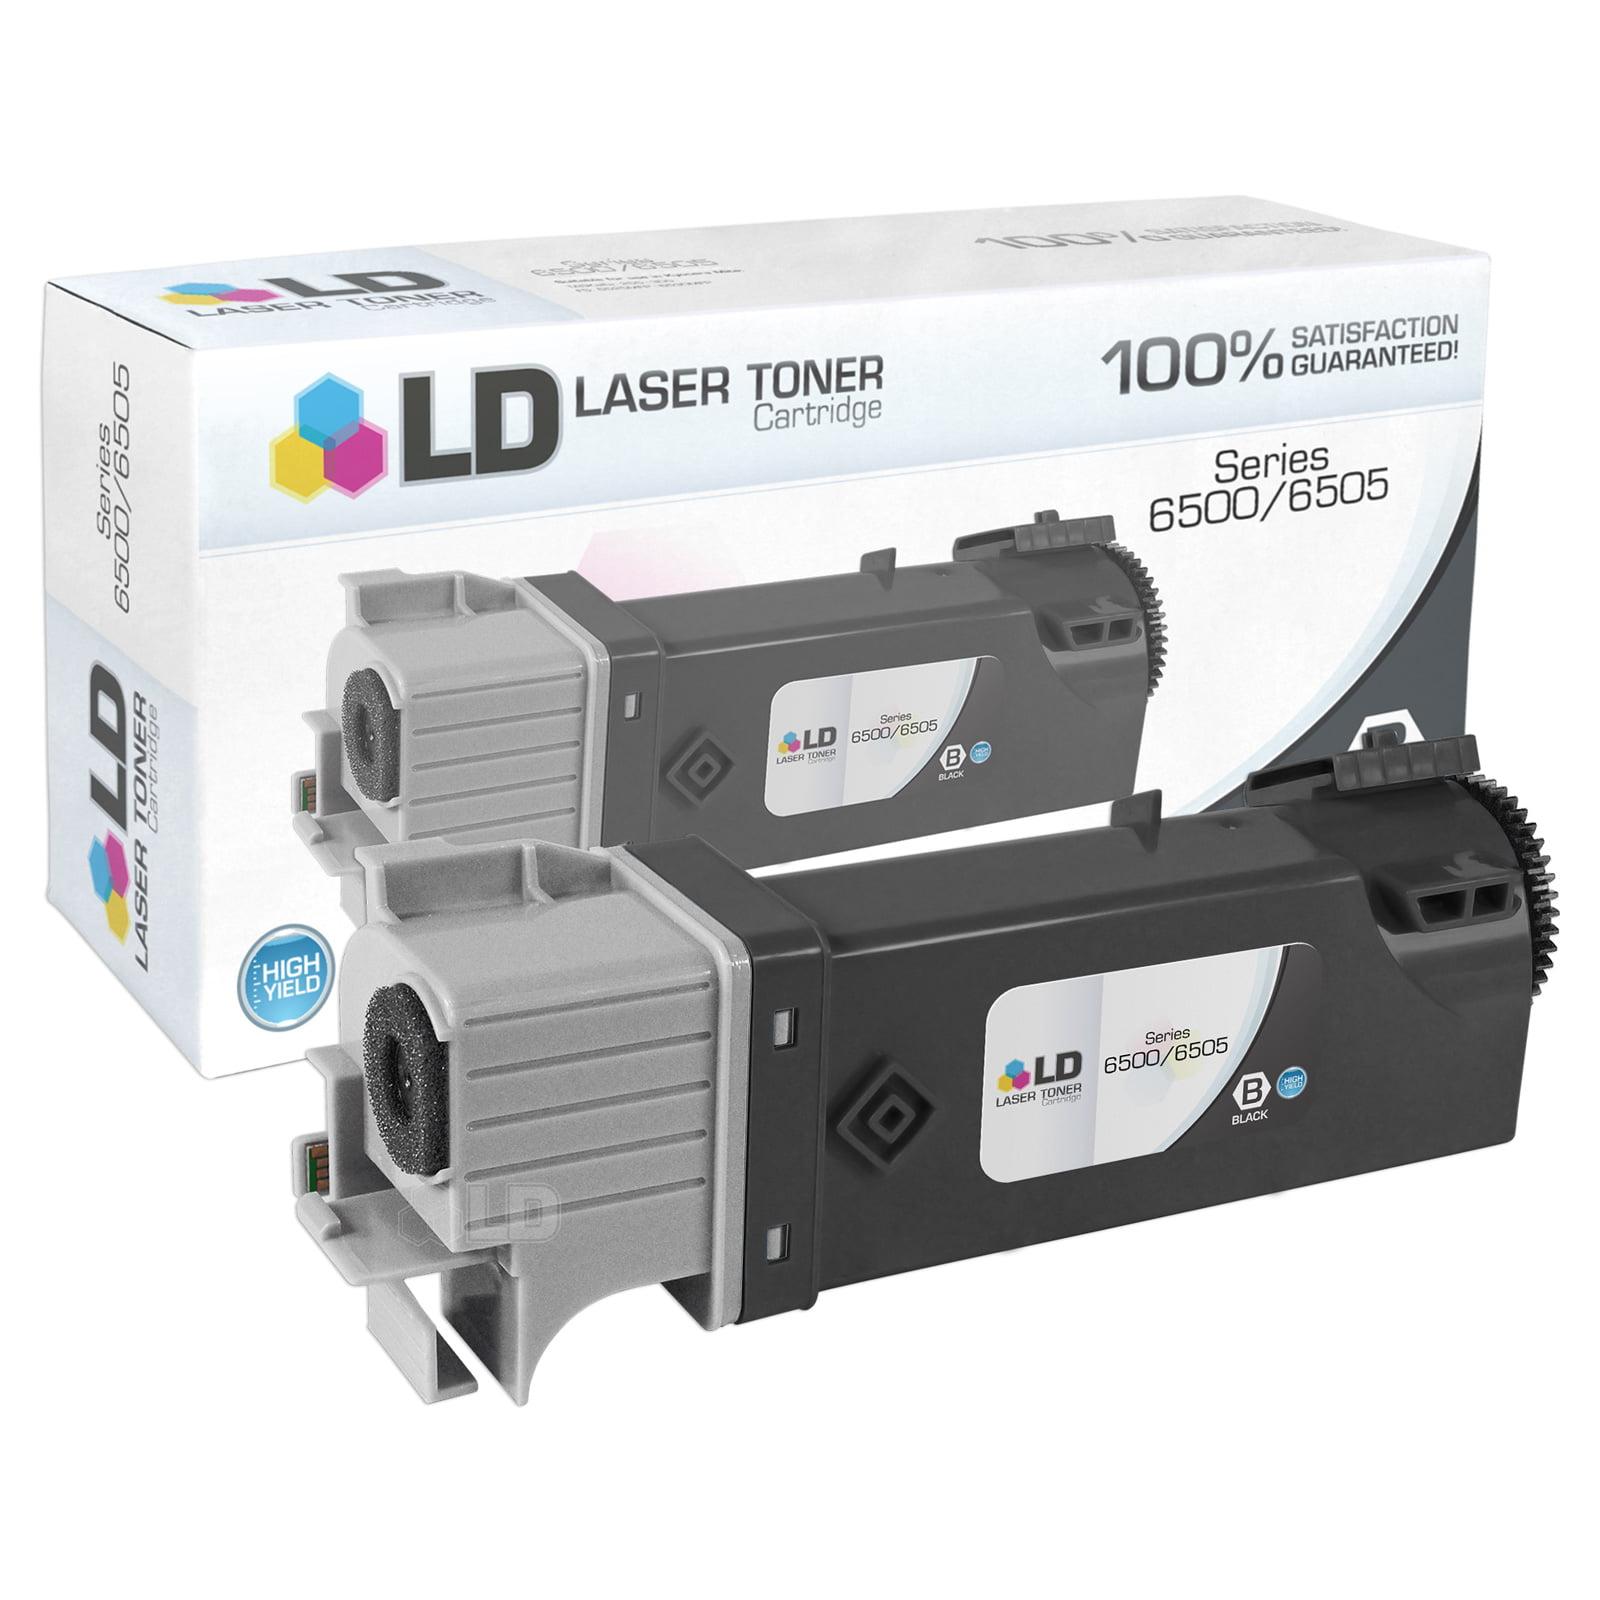 LD Compatible Xerox Phaser 6500 Toner Cartridges:106R01597 BLK, 106R01594 C, 106R01595 M, 106R01596 Y